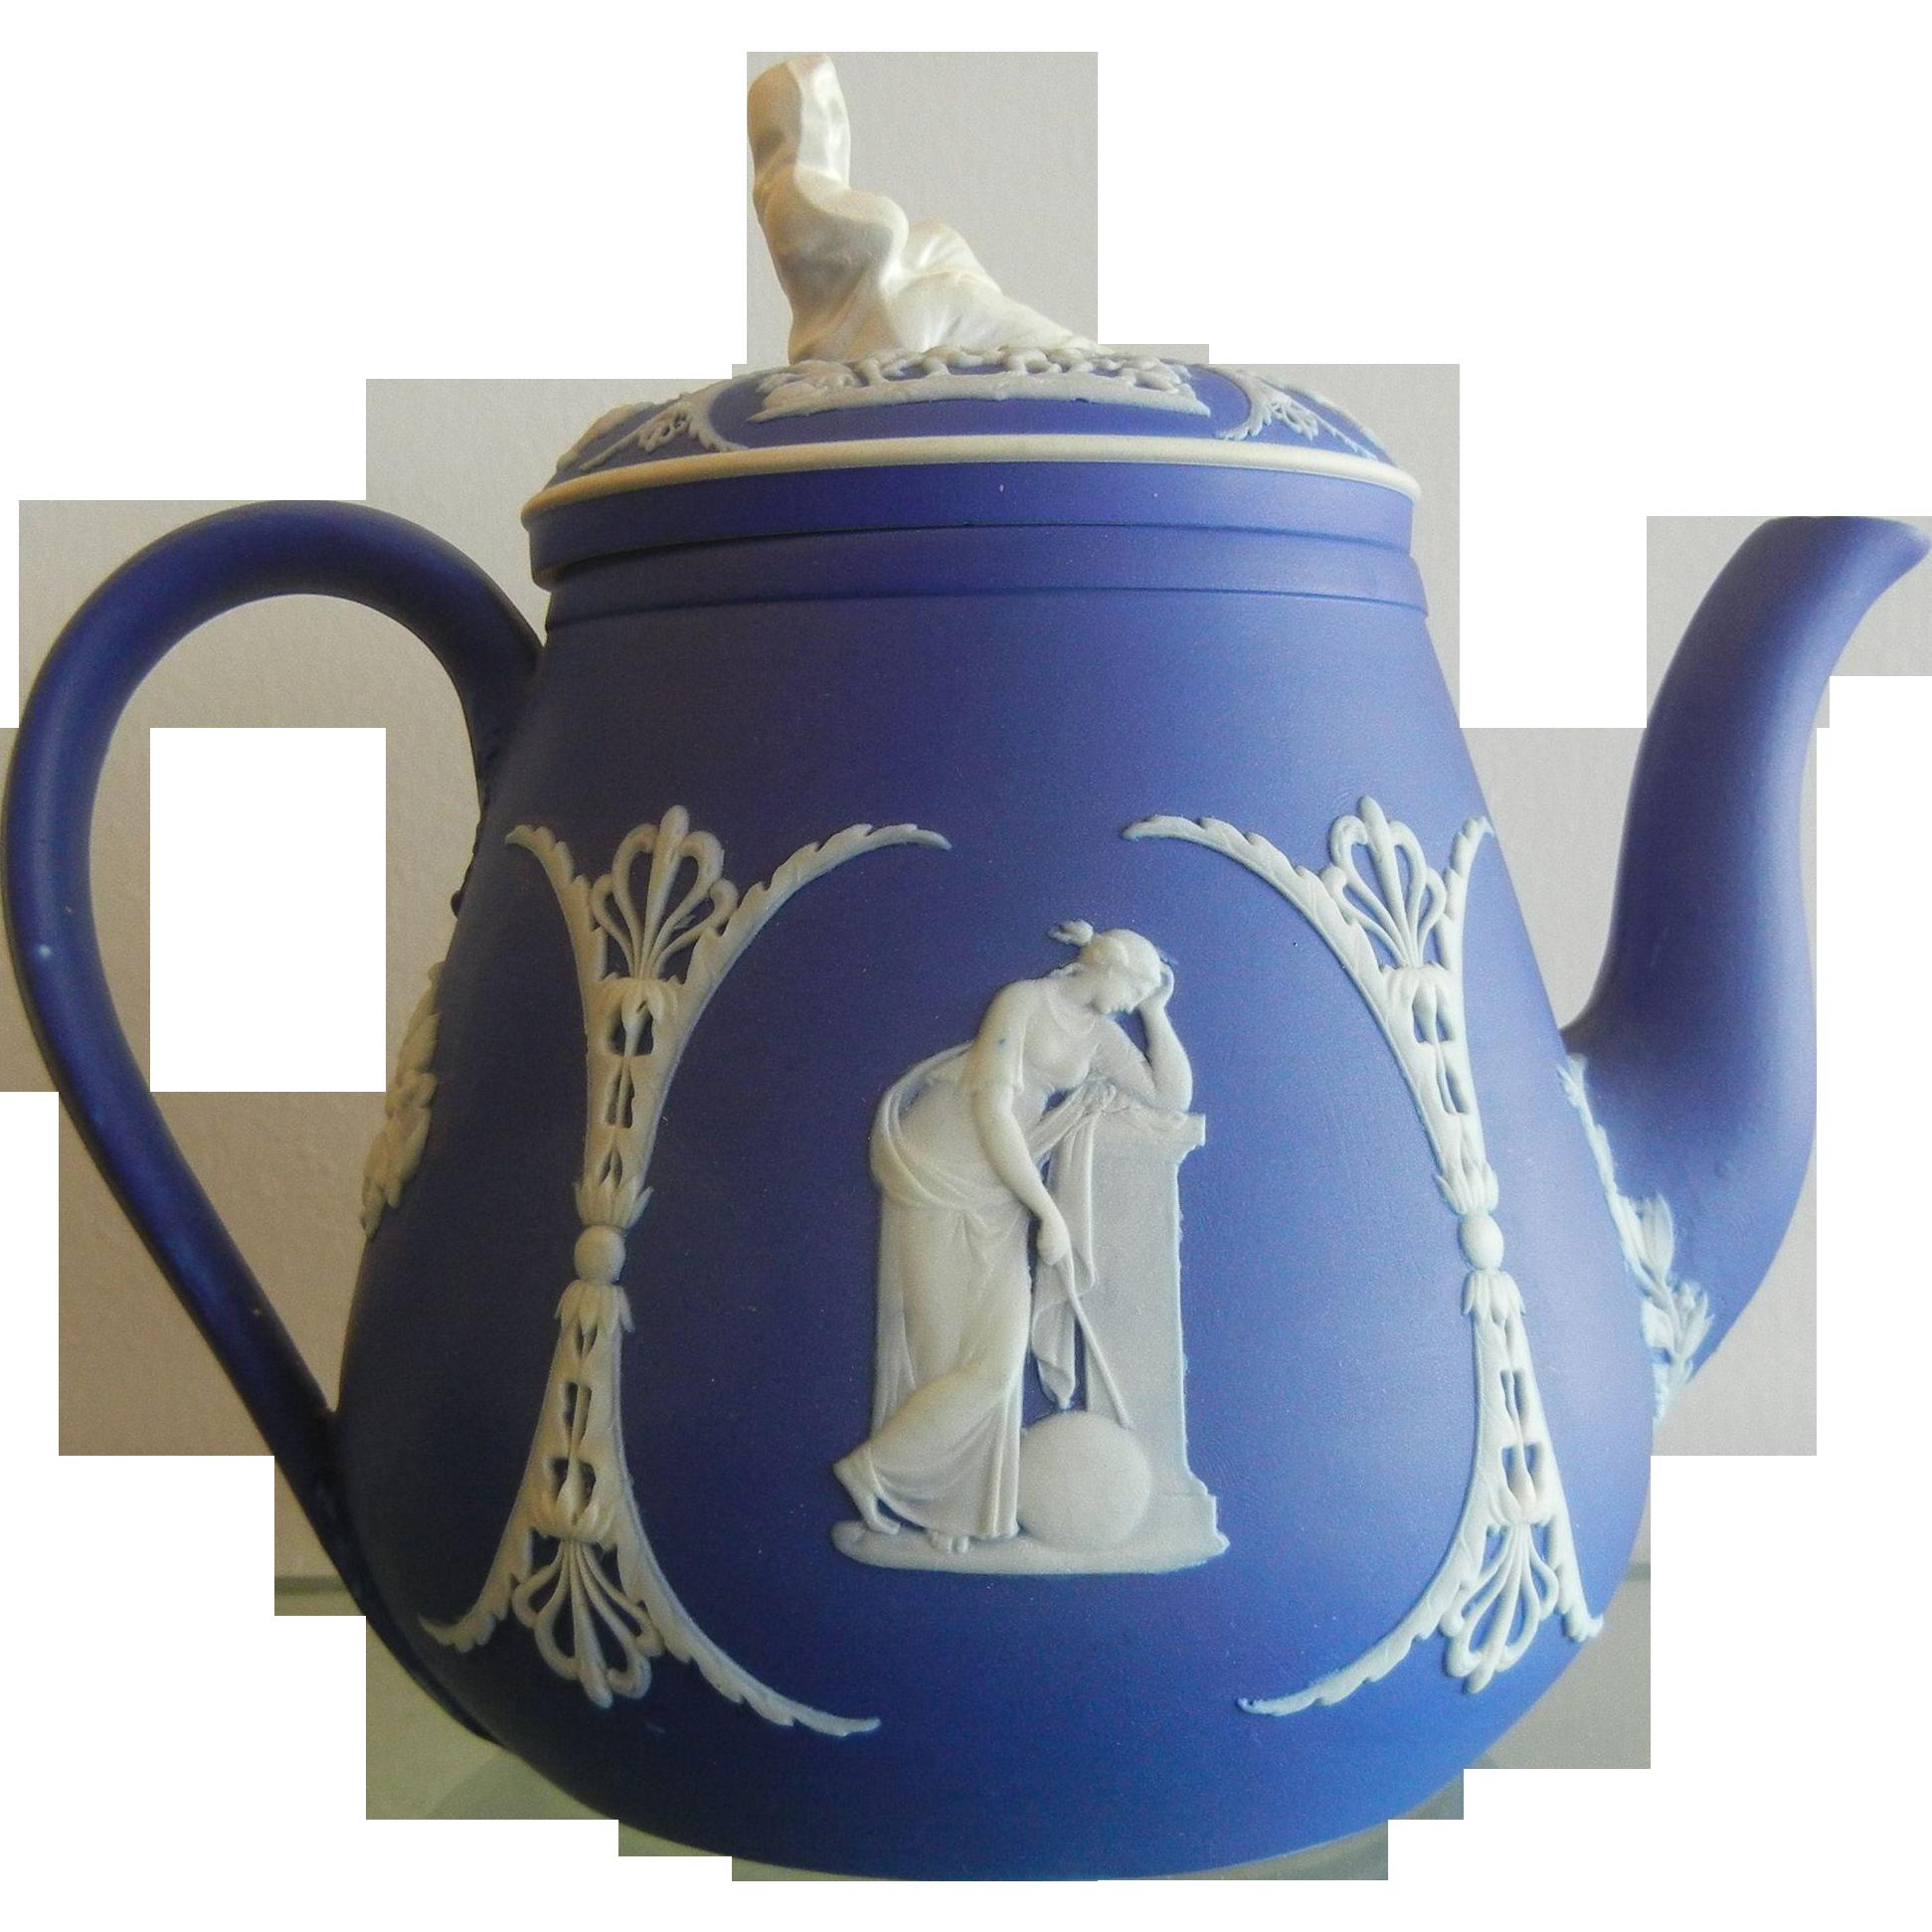 "Wedgwood "" Tofts Patent"" Jasper Blue & White Porcelain Teapot"